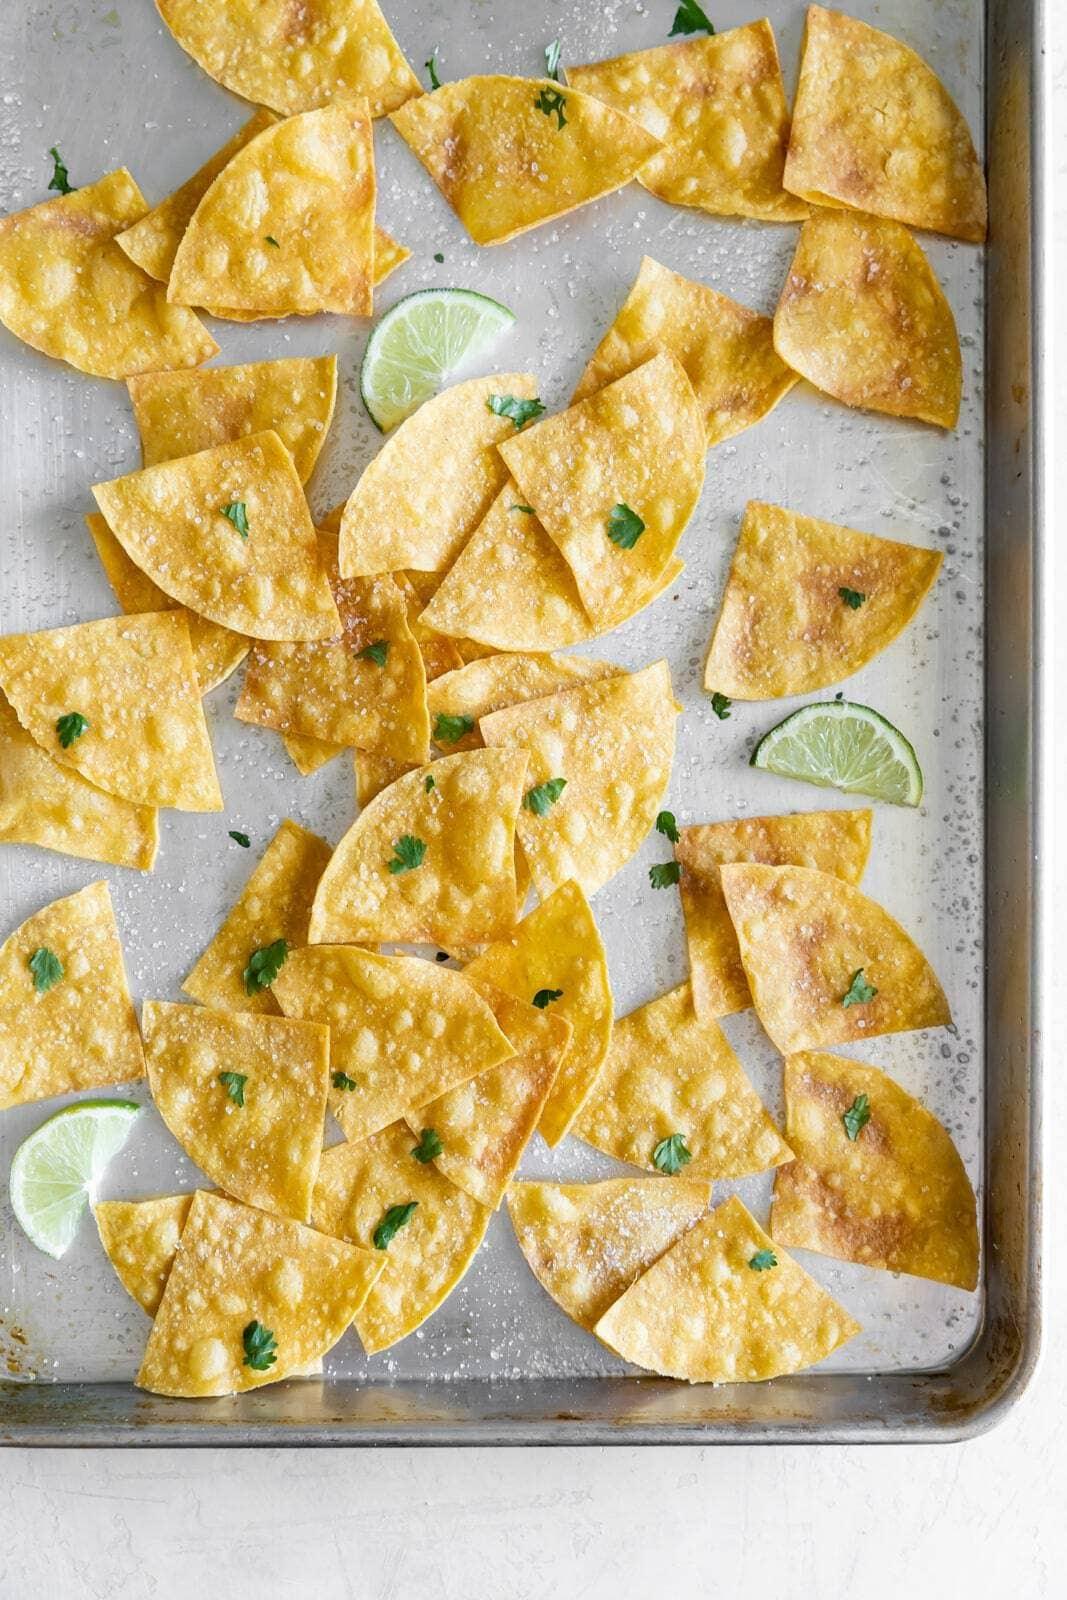 3 Ingredient Baked Sea Salt Tortilla Chips A Sassy Spoon